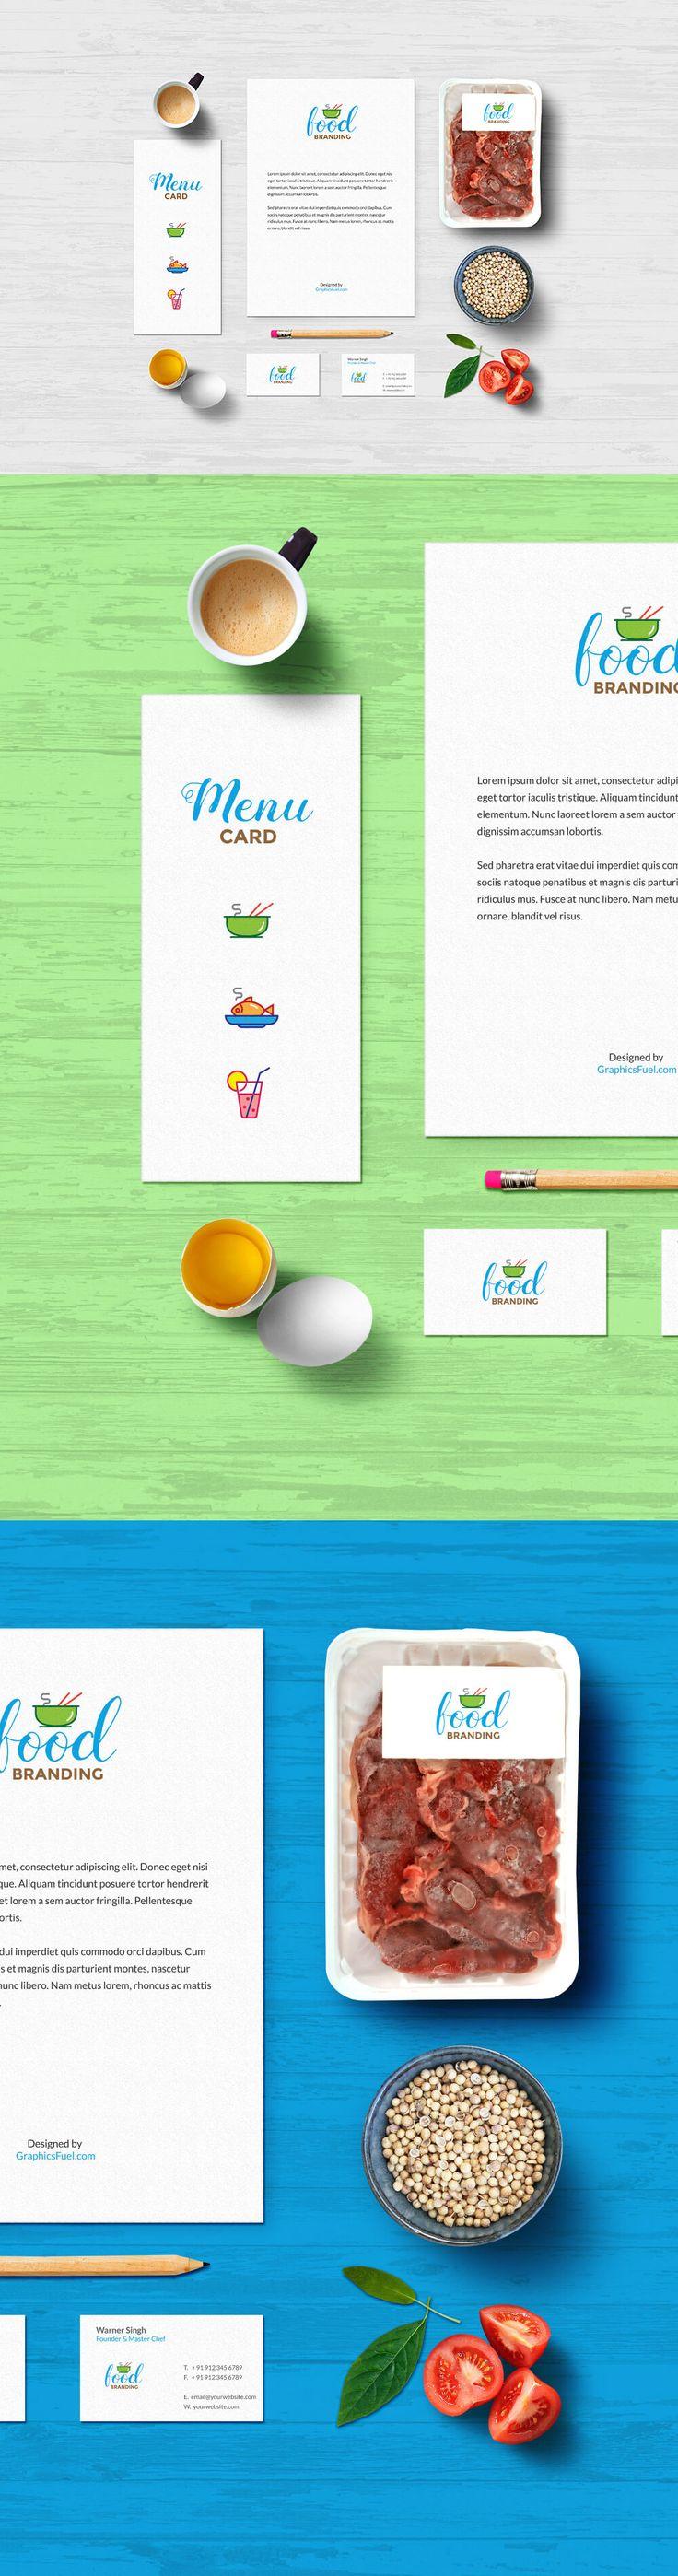 72 best Graphic Design LOGOS BRANDING & IDENTITY images on